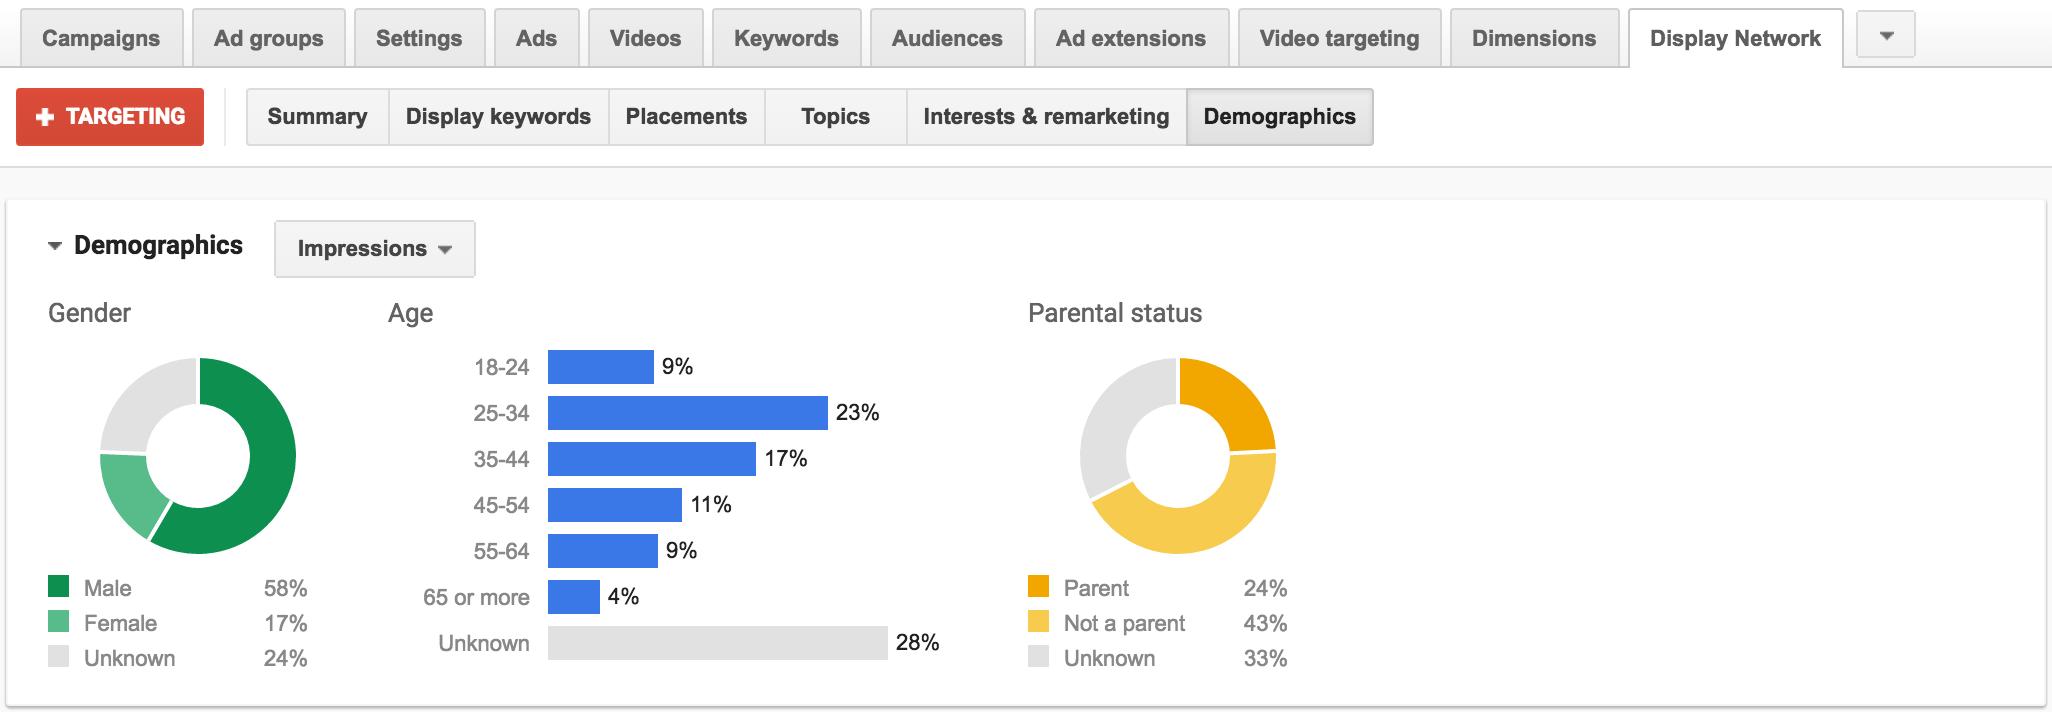 display-network-demographics